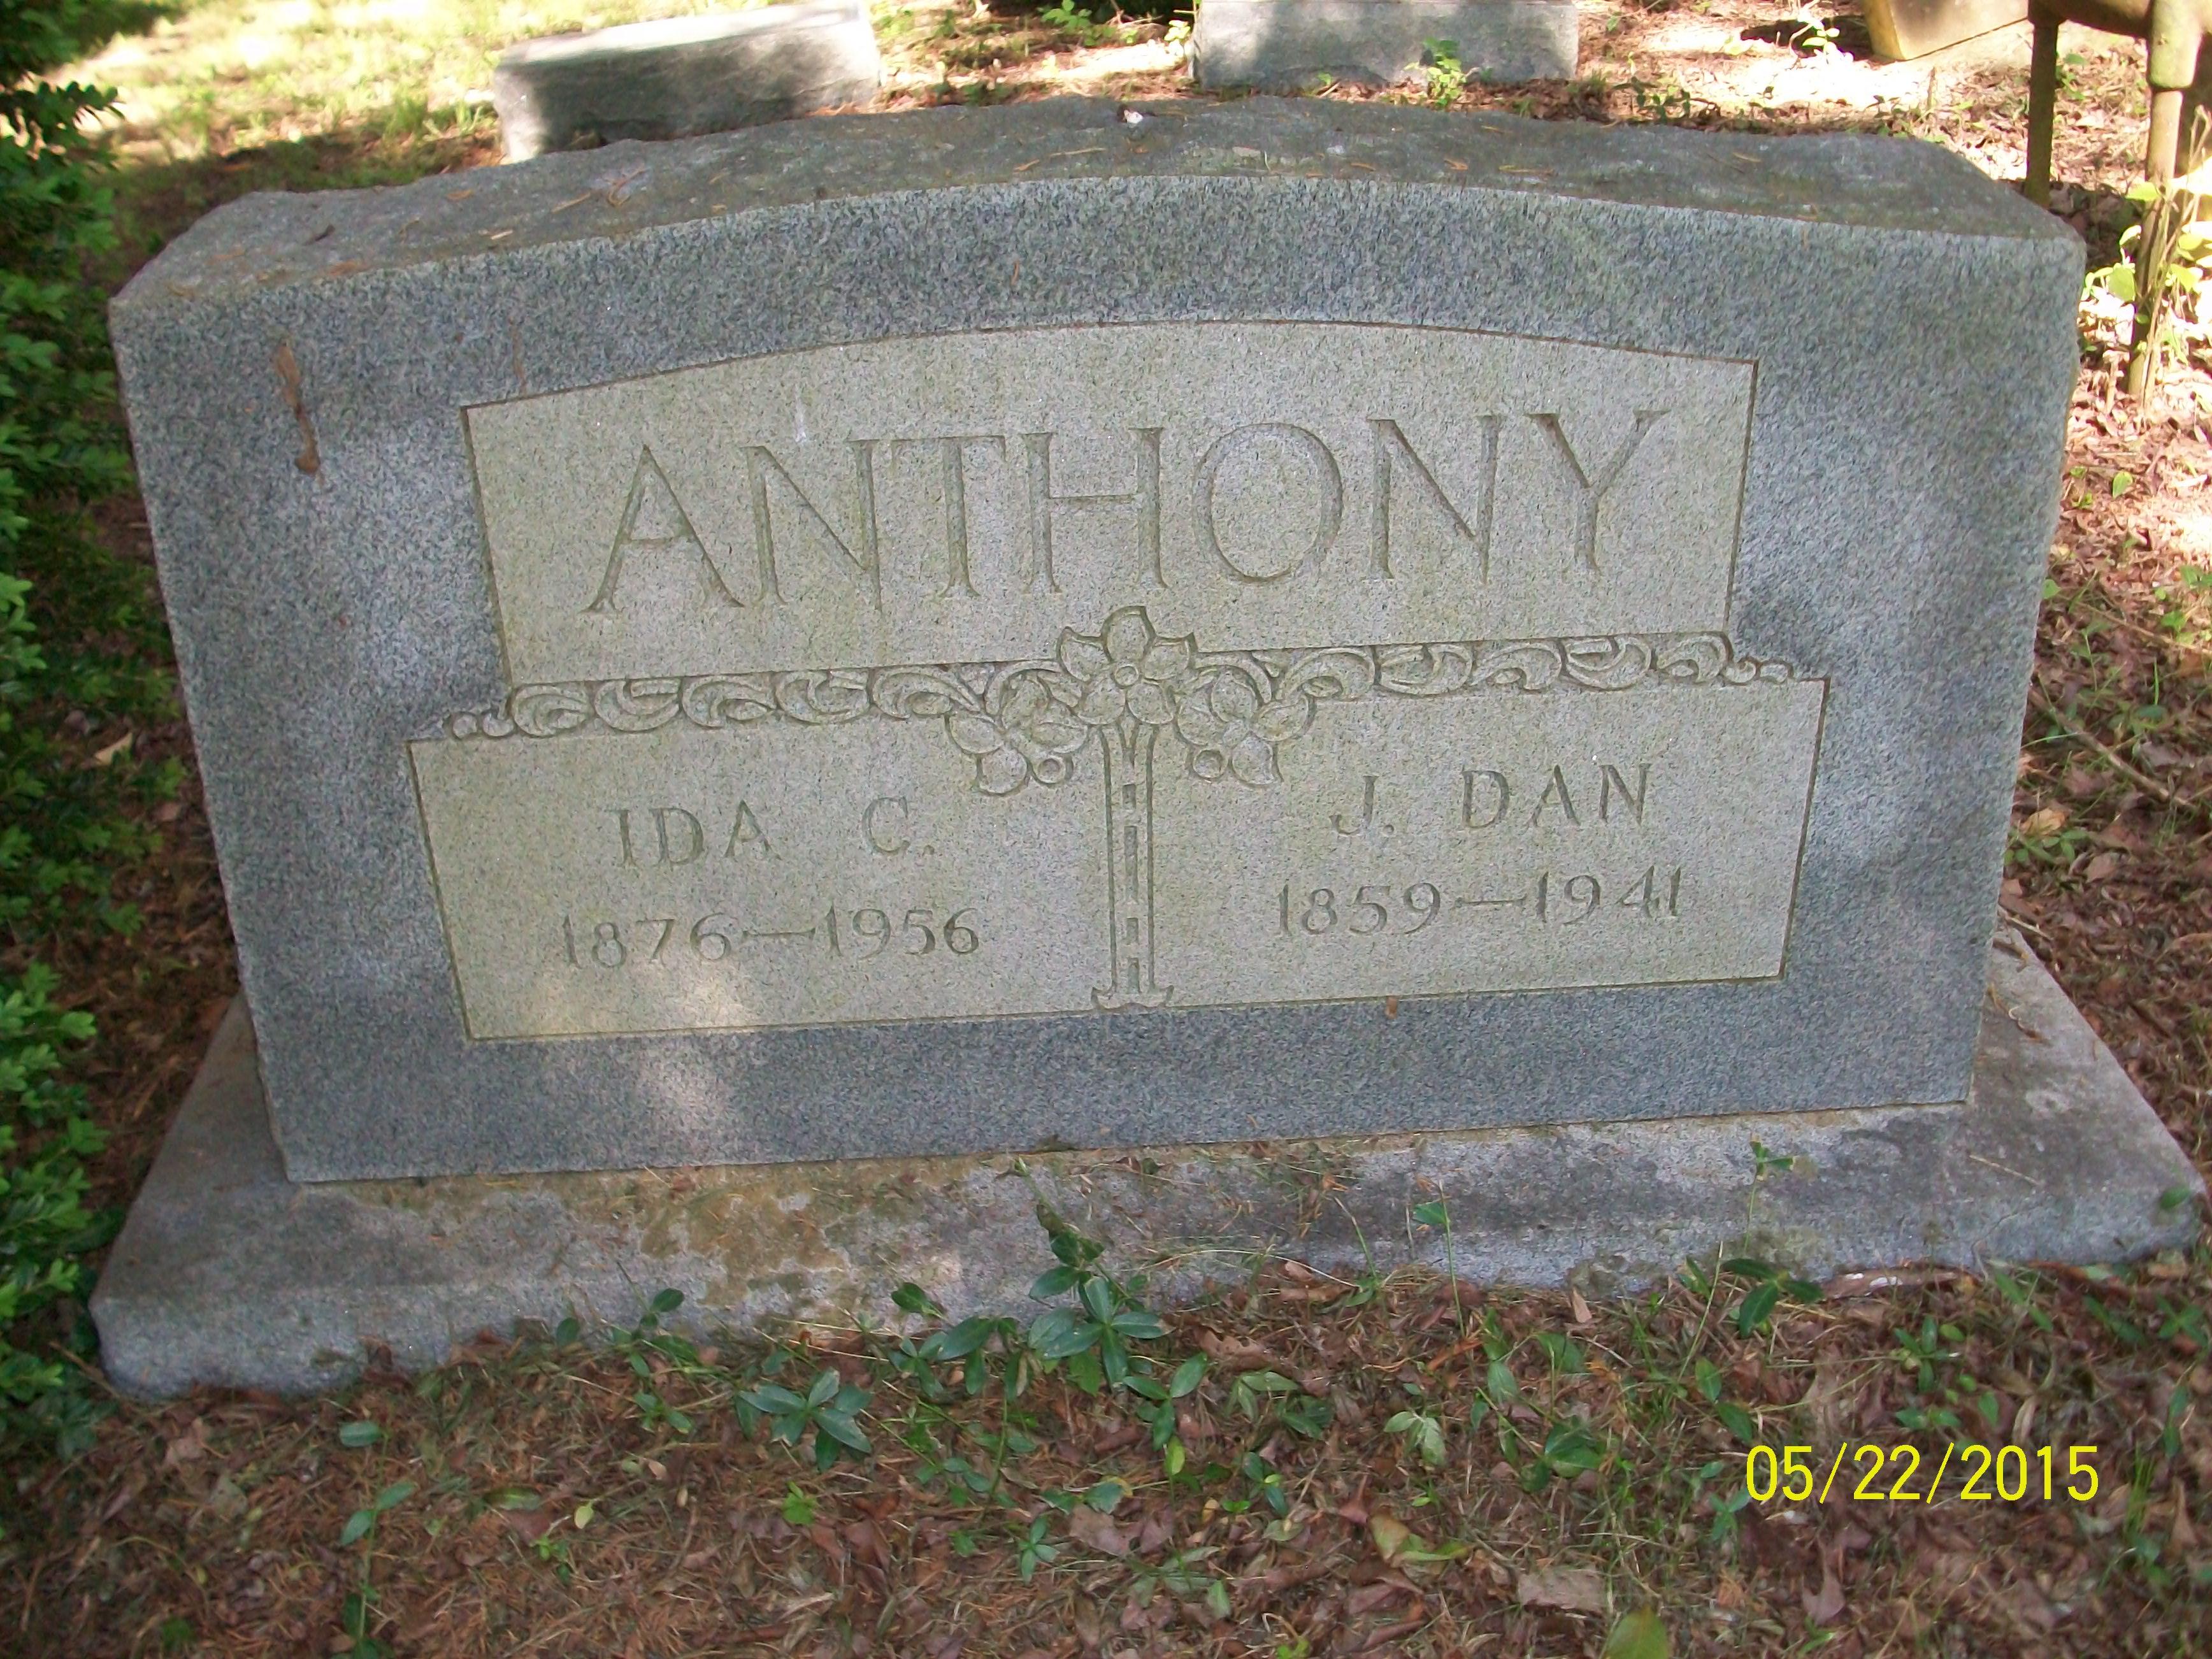 J. Dan Anthony